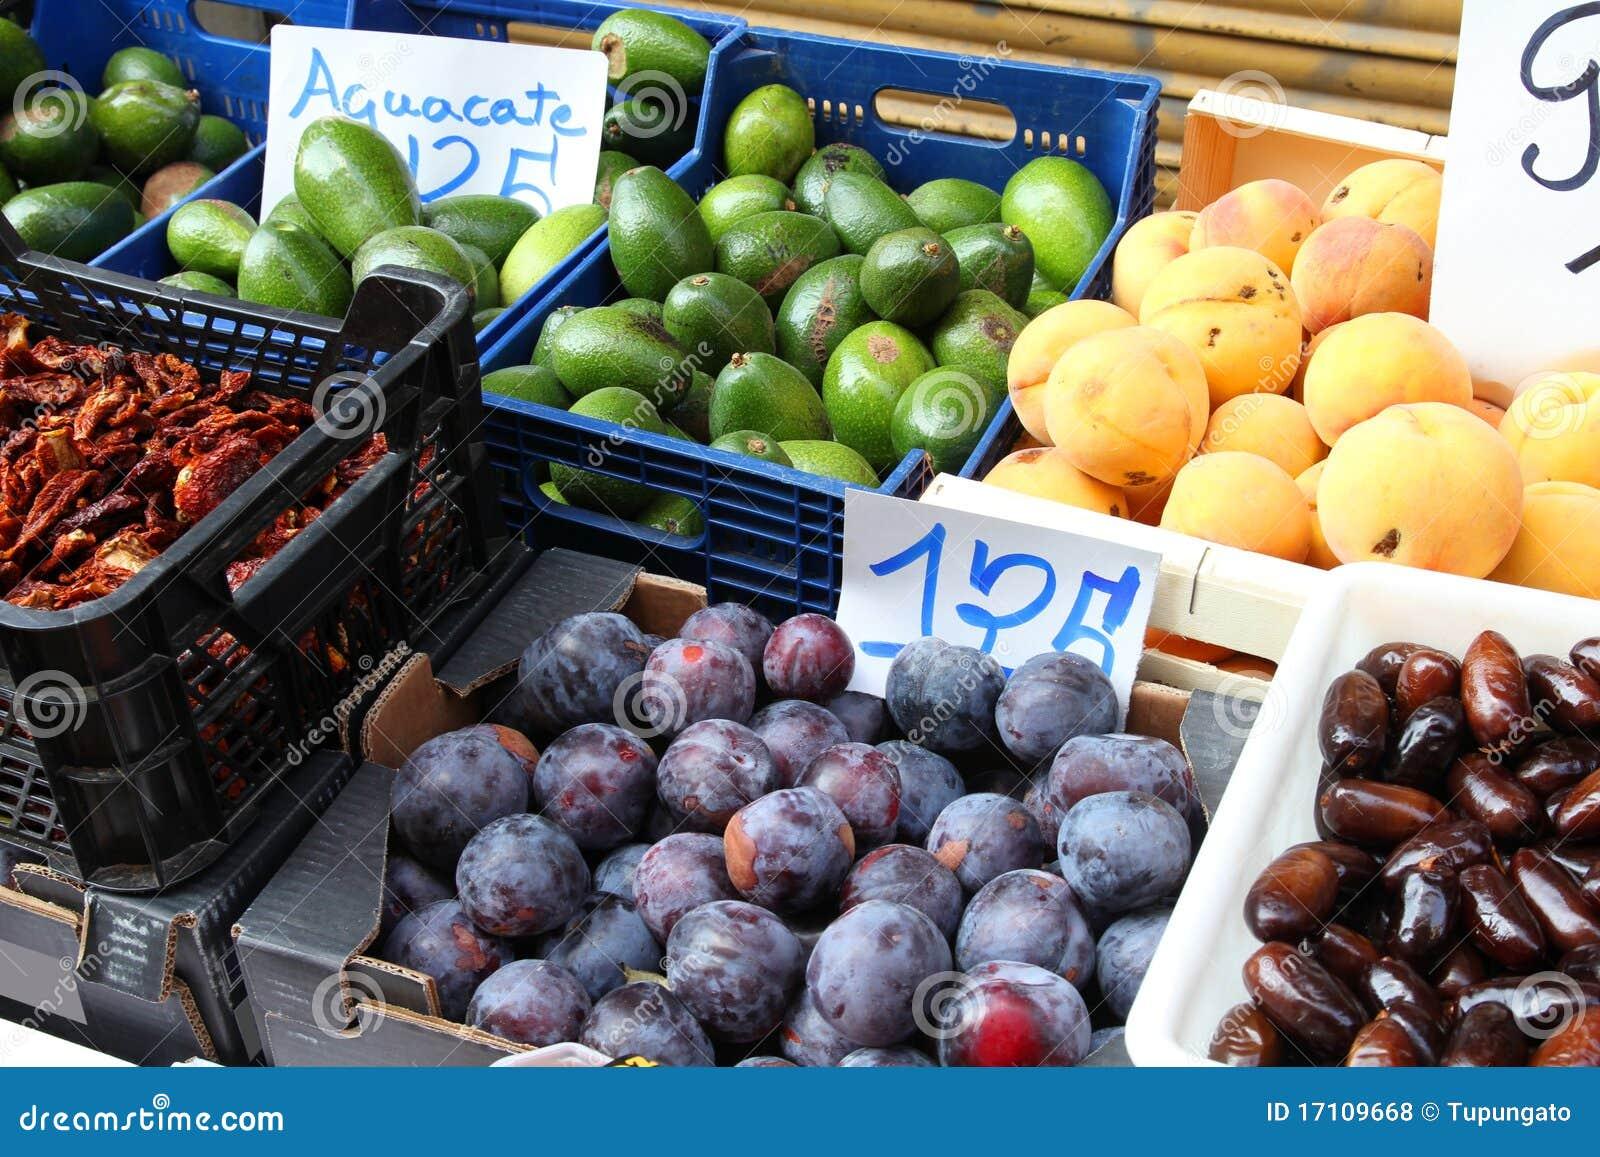 granada fruit is avocado a fruit or vegetable